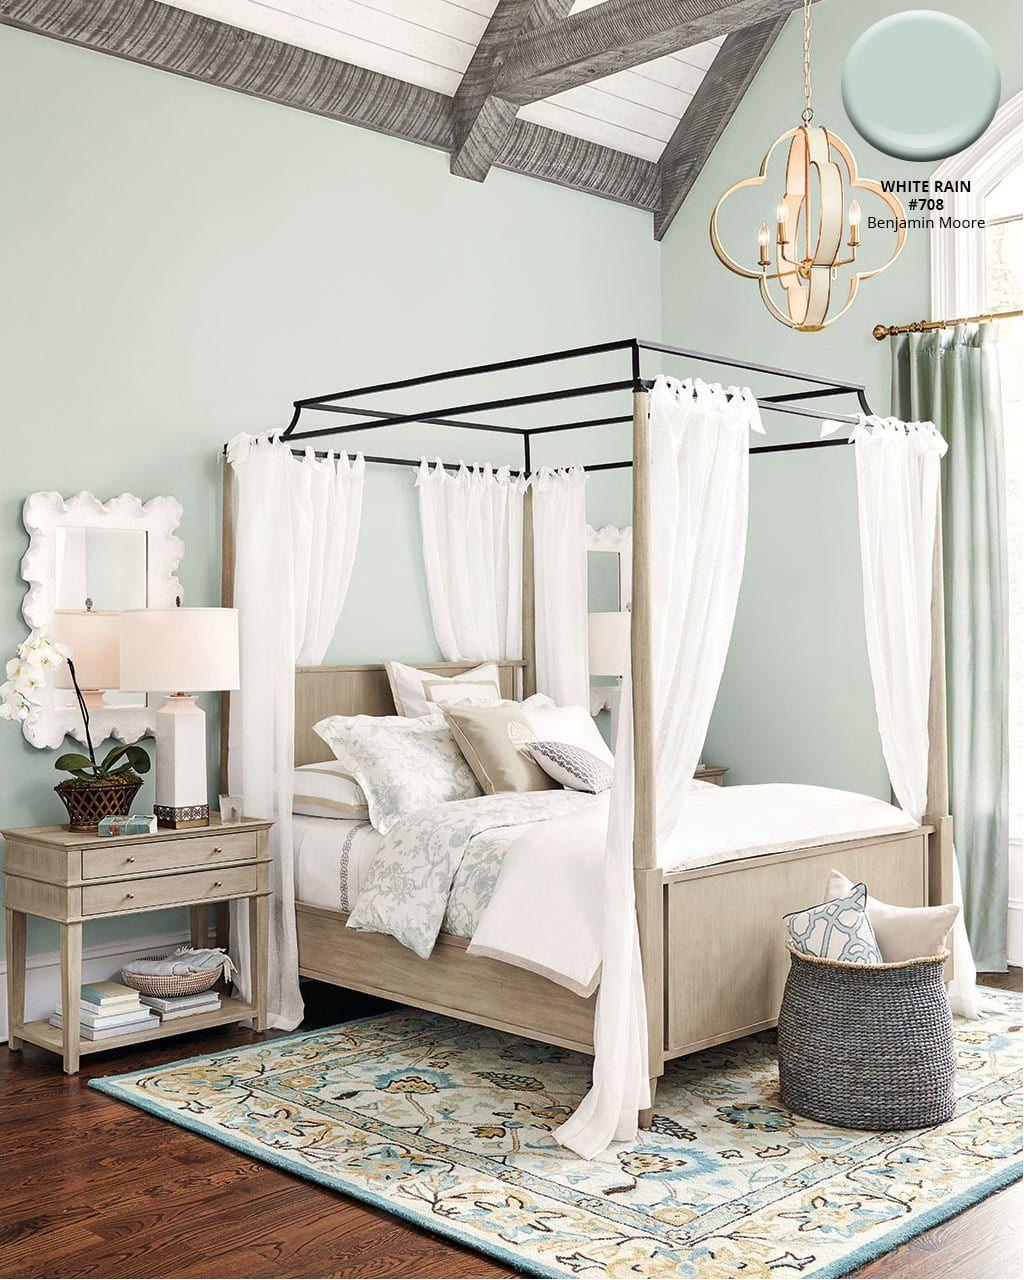 Fall 2018 Catalog Paint Colors Neutral bedroom decor